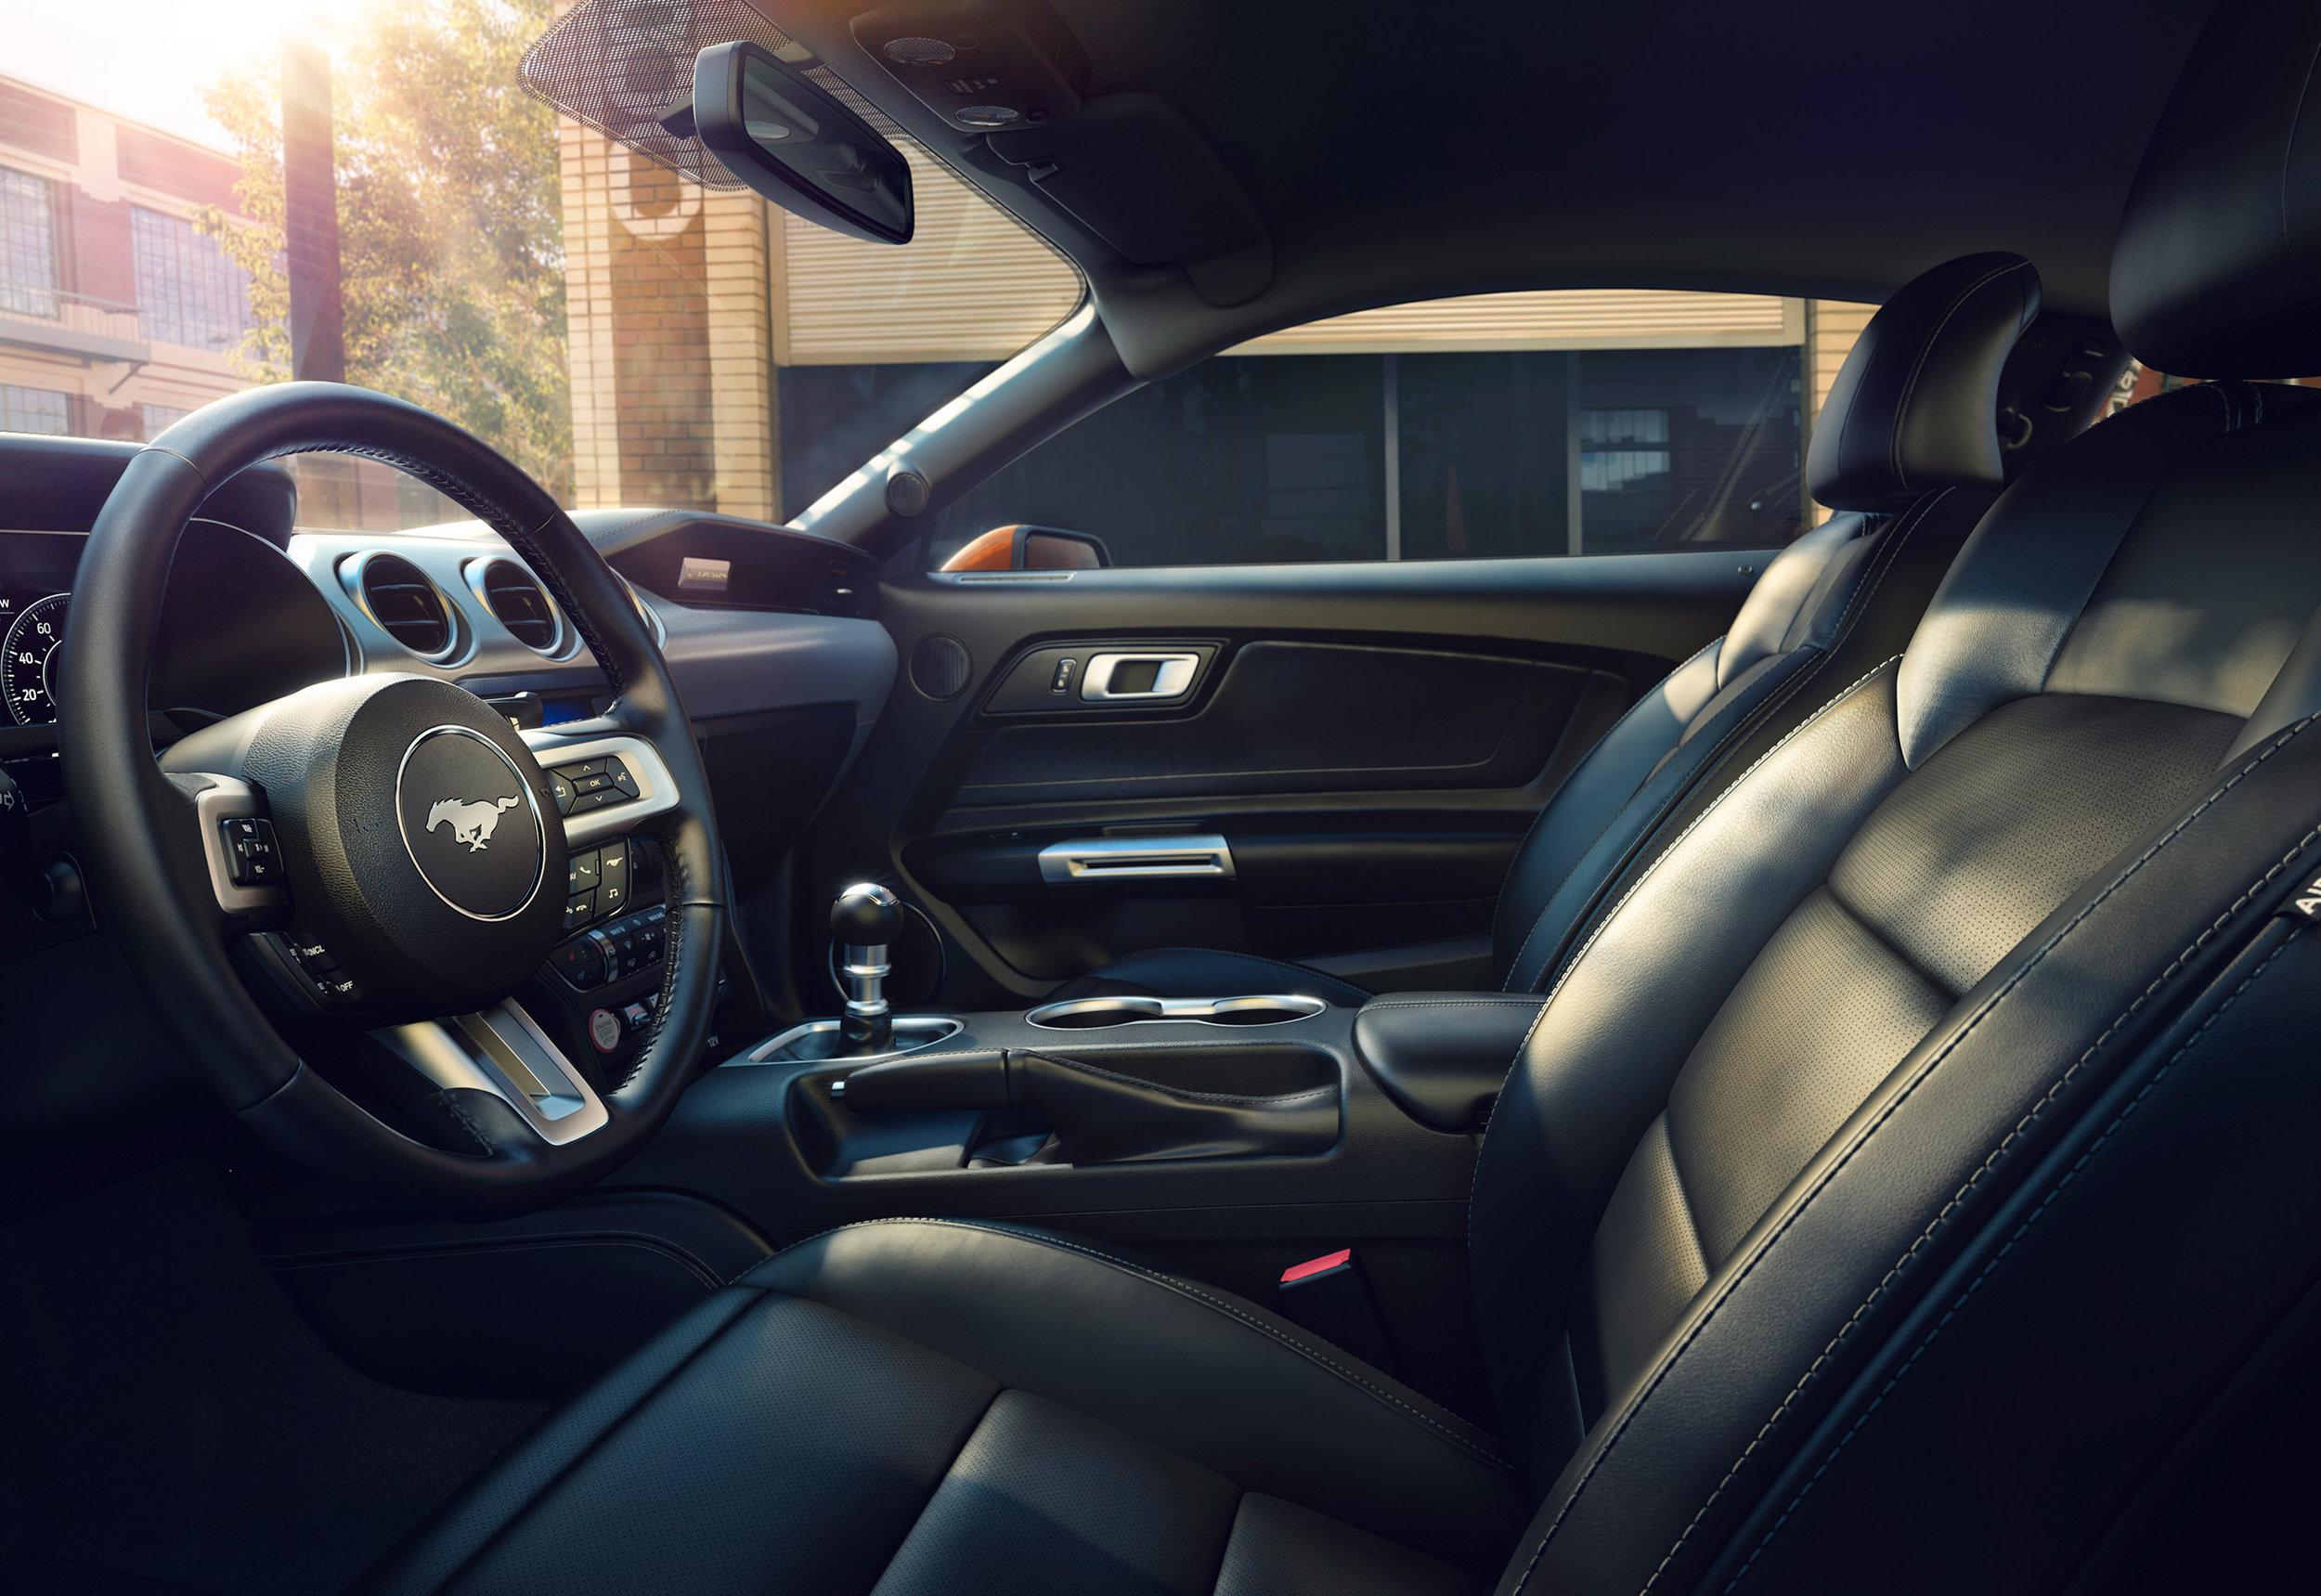 New-Ford-Mustang-Interior-2.jpg